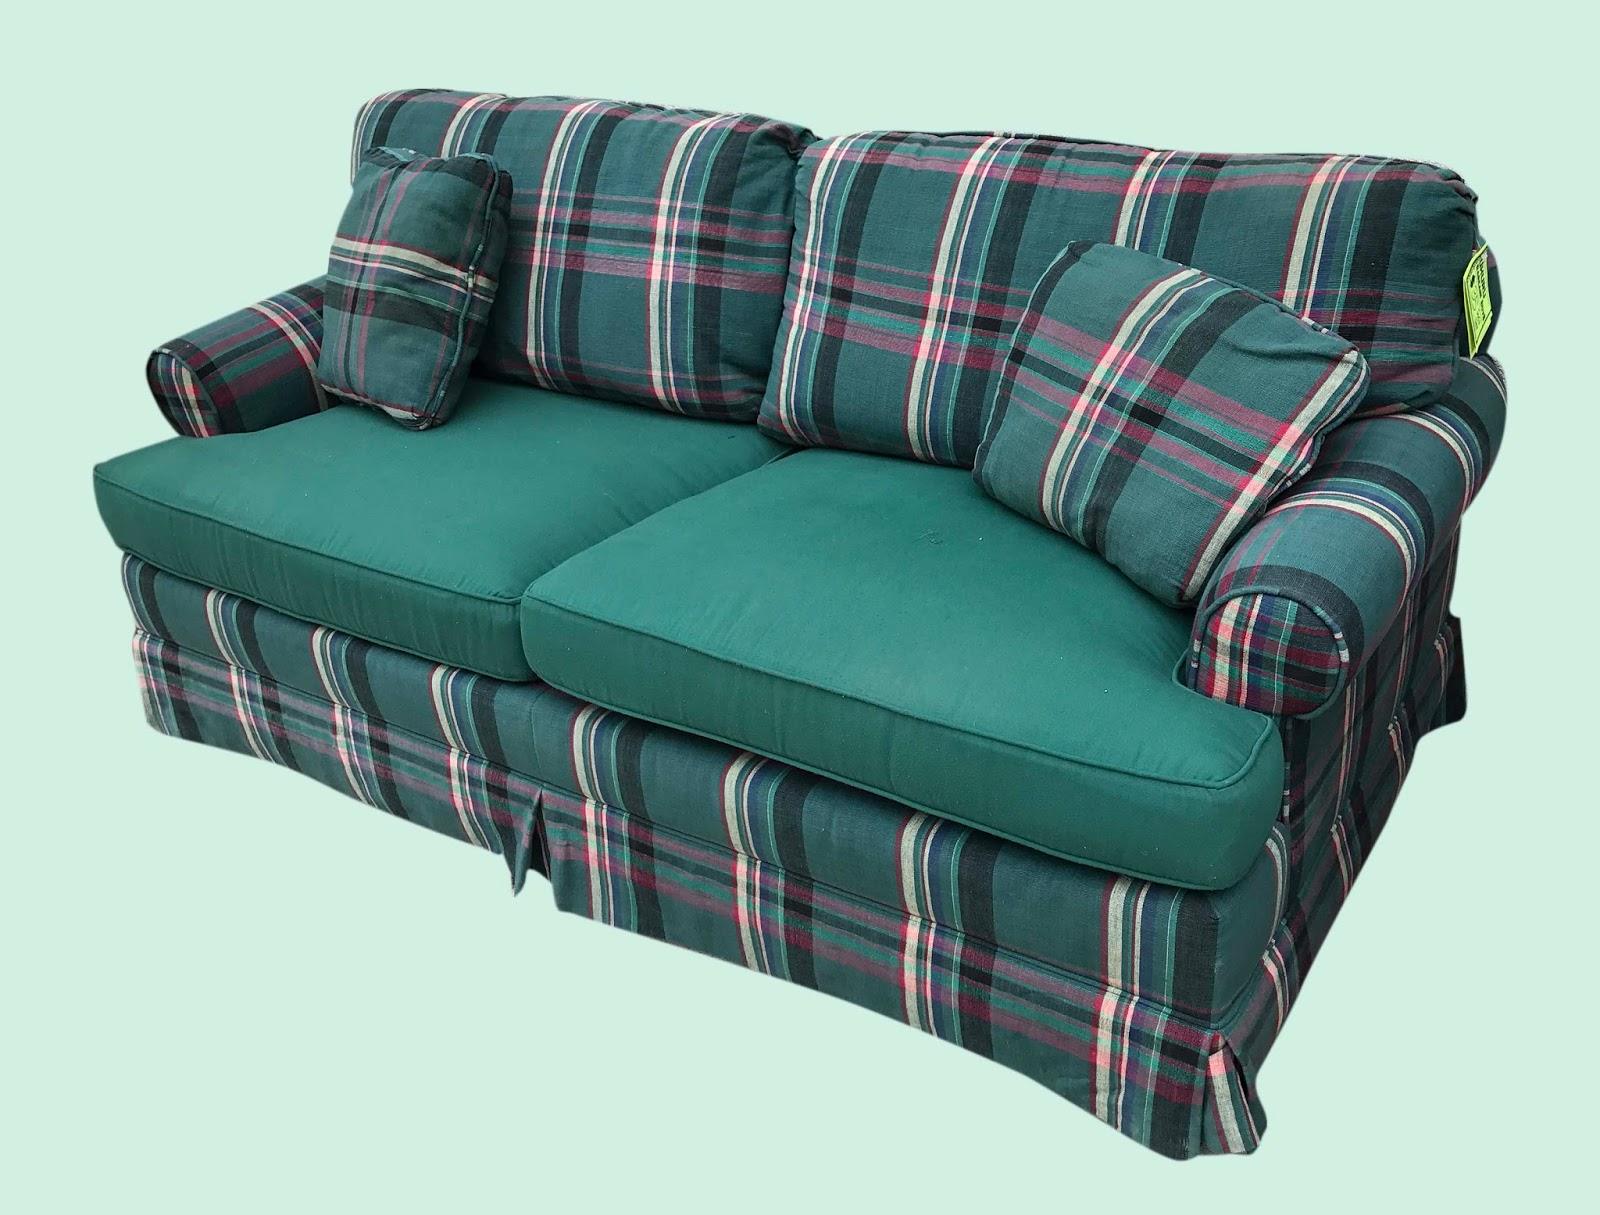 Uhuru Furniture Collectibles Plaid Sofa 35 Sold